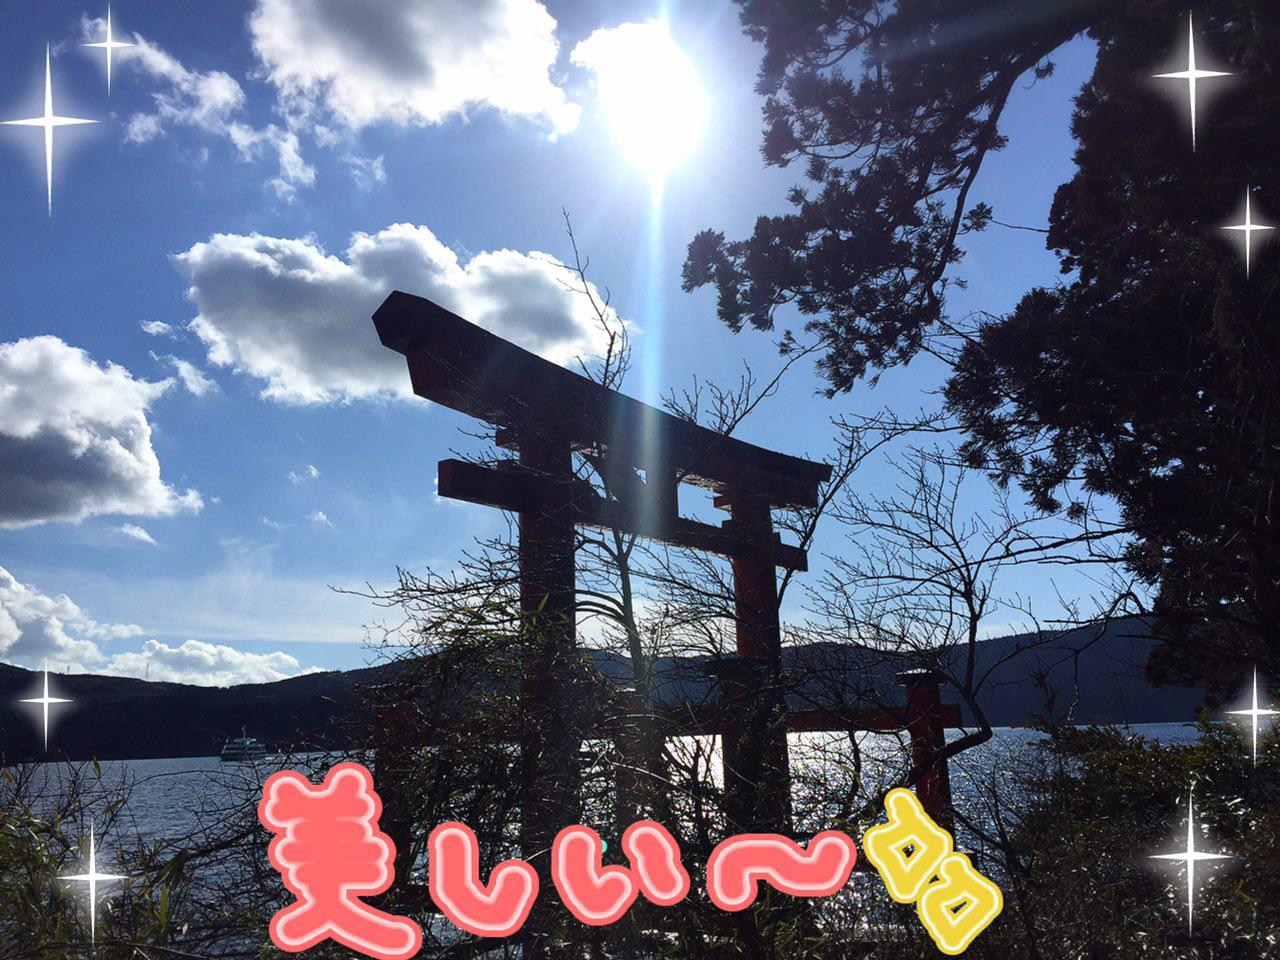 photo_2017-02-26_01-13-00.jpg